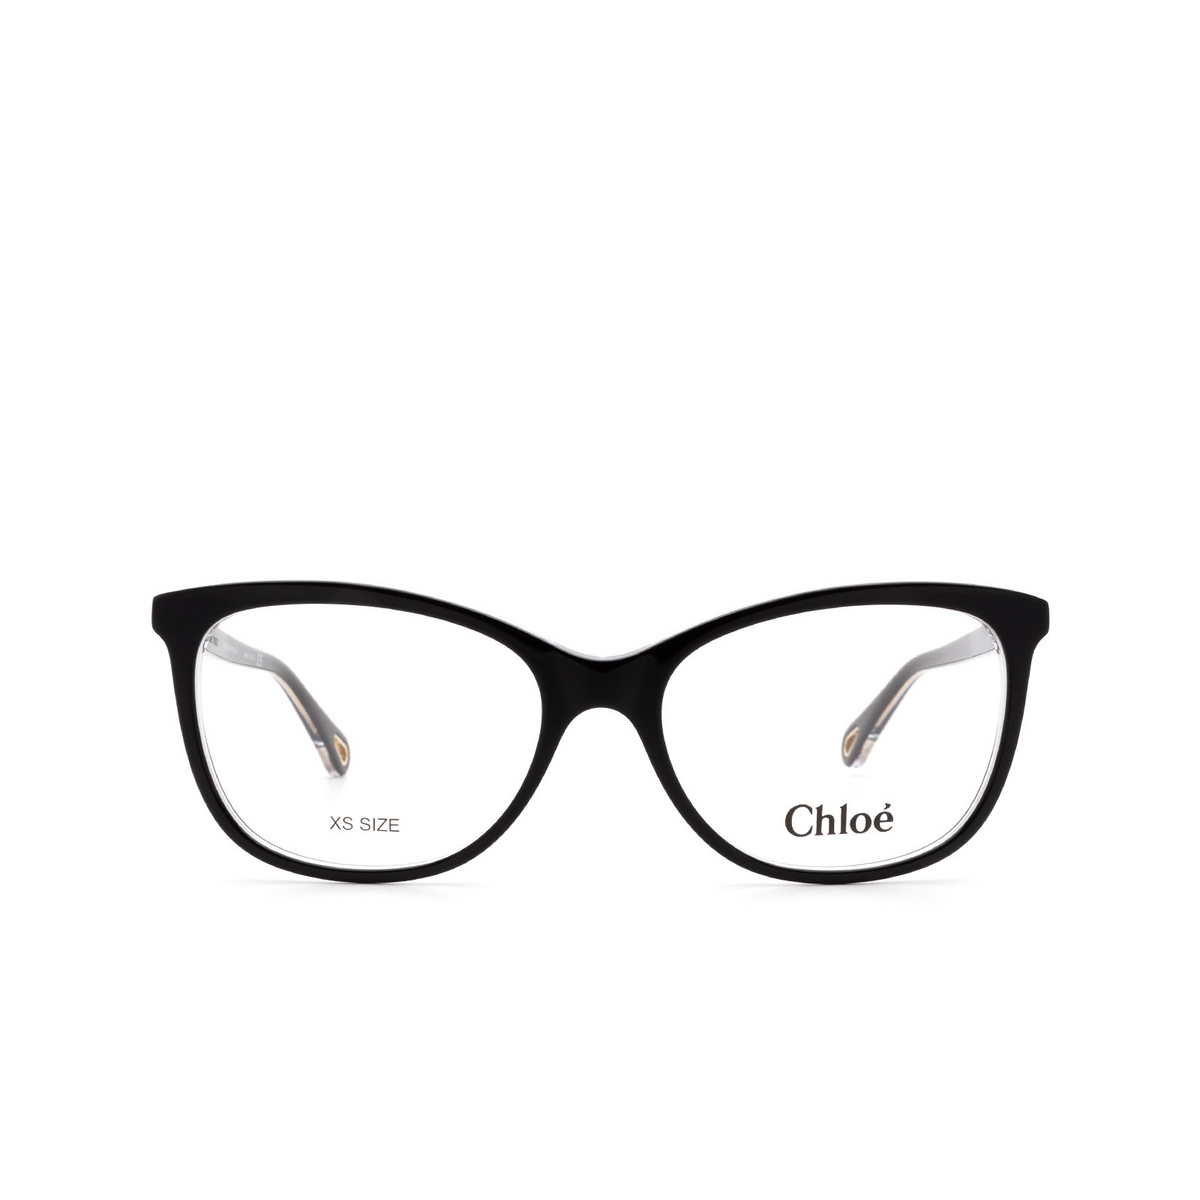 Chloé® Rectangle Eyeglasses: CH0013O color Black 004 - front view.